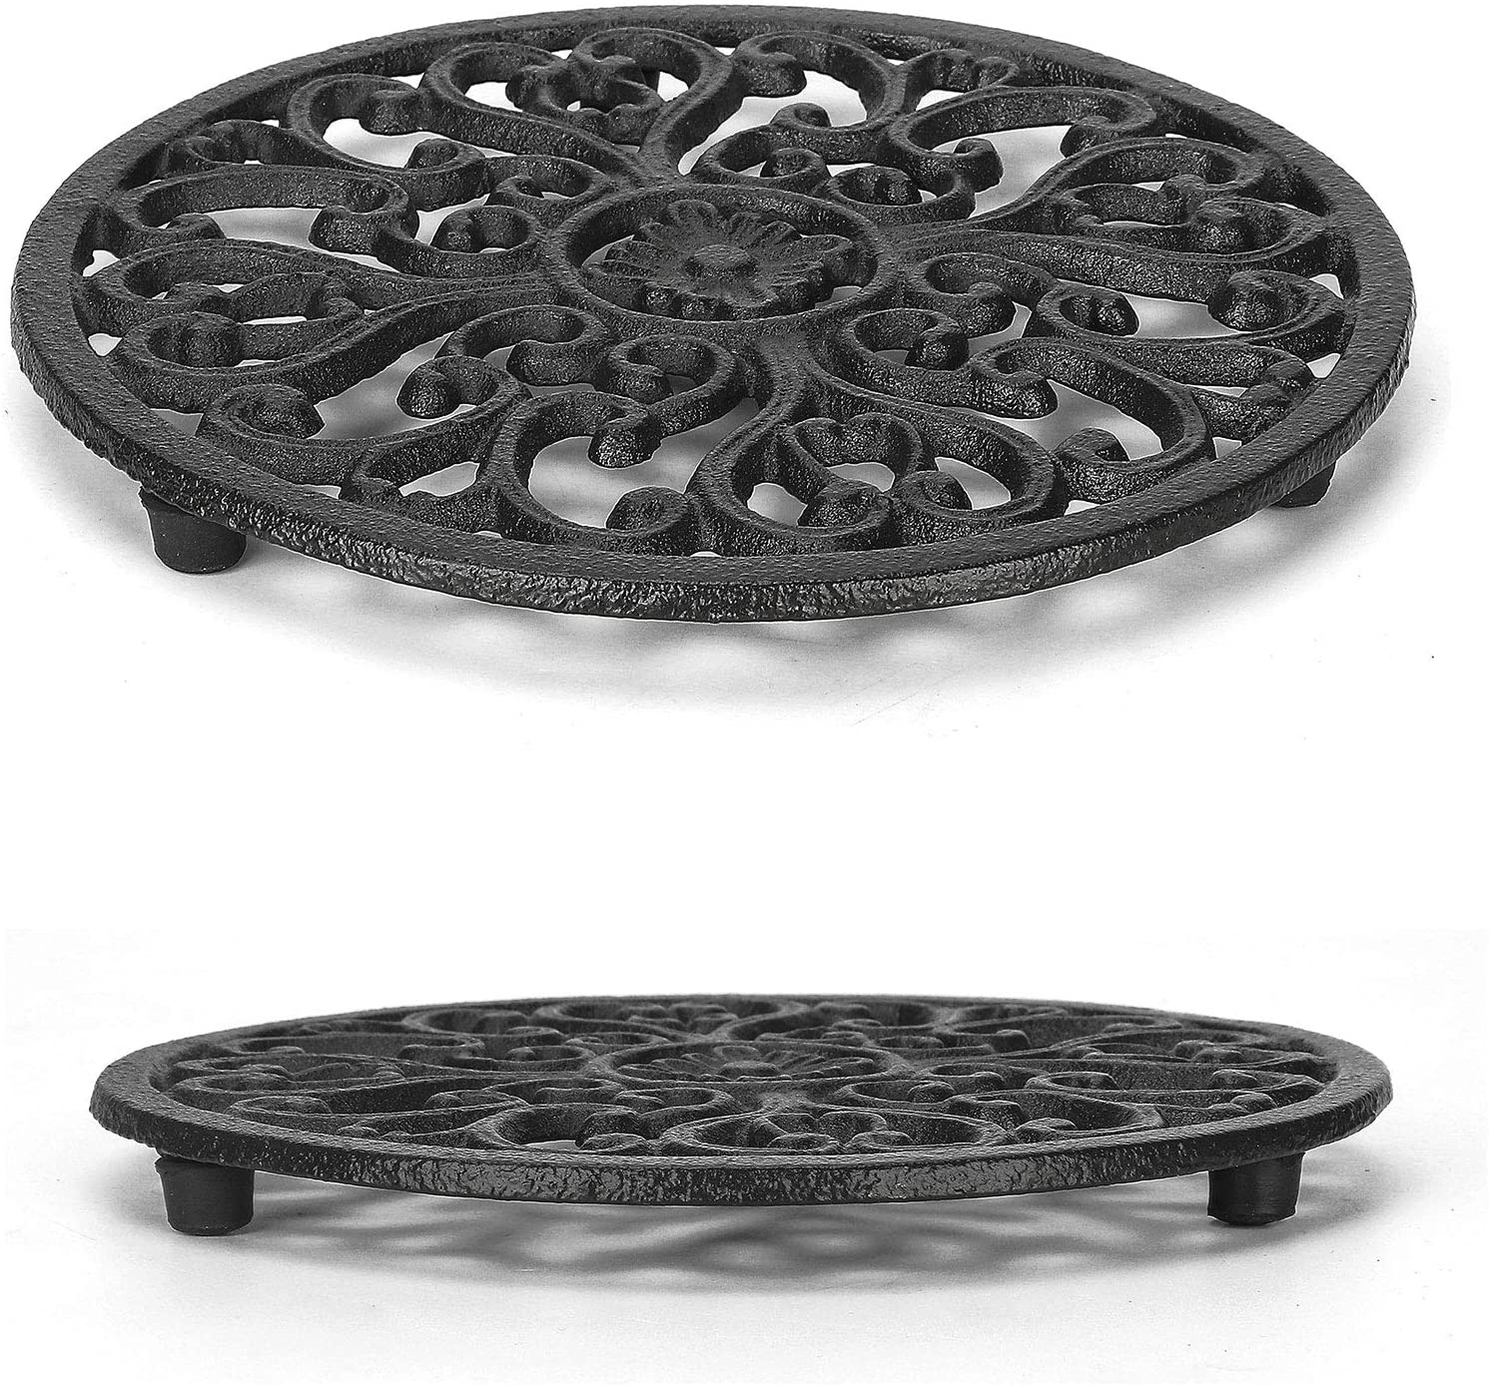 Trivet 6.7 Inch, Cast Iron Trivet With Rubber Pegs/Feet Non-Slip, Rustic Trivets For Hot Pots And Pans, Decorative Kitchen Trivet Mats Hot Pads Pot Coasters(2 Pack)